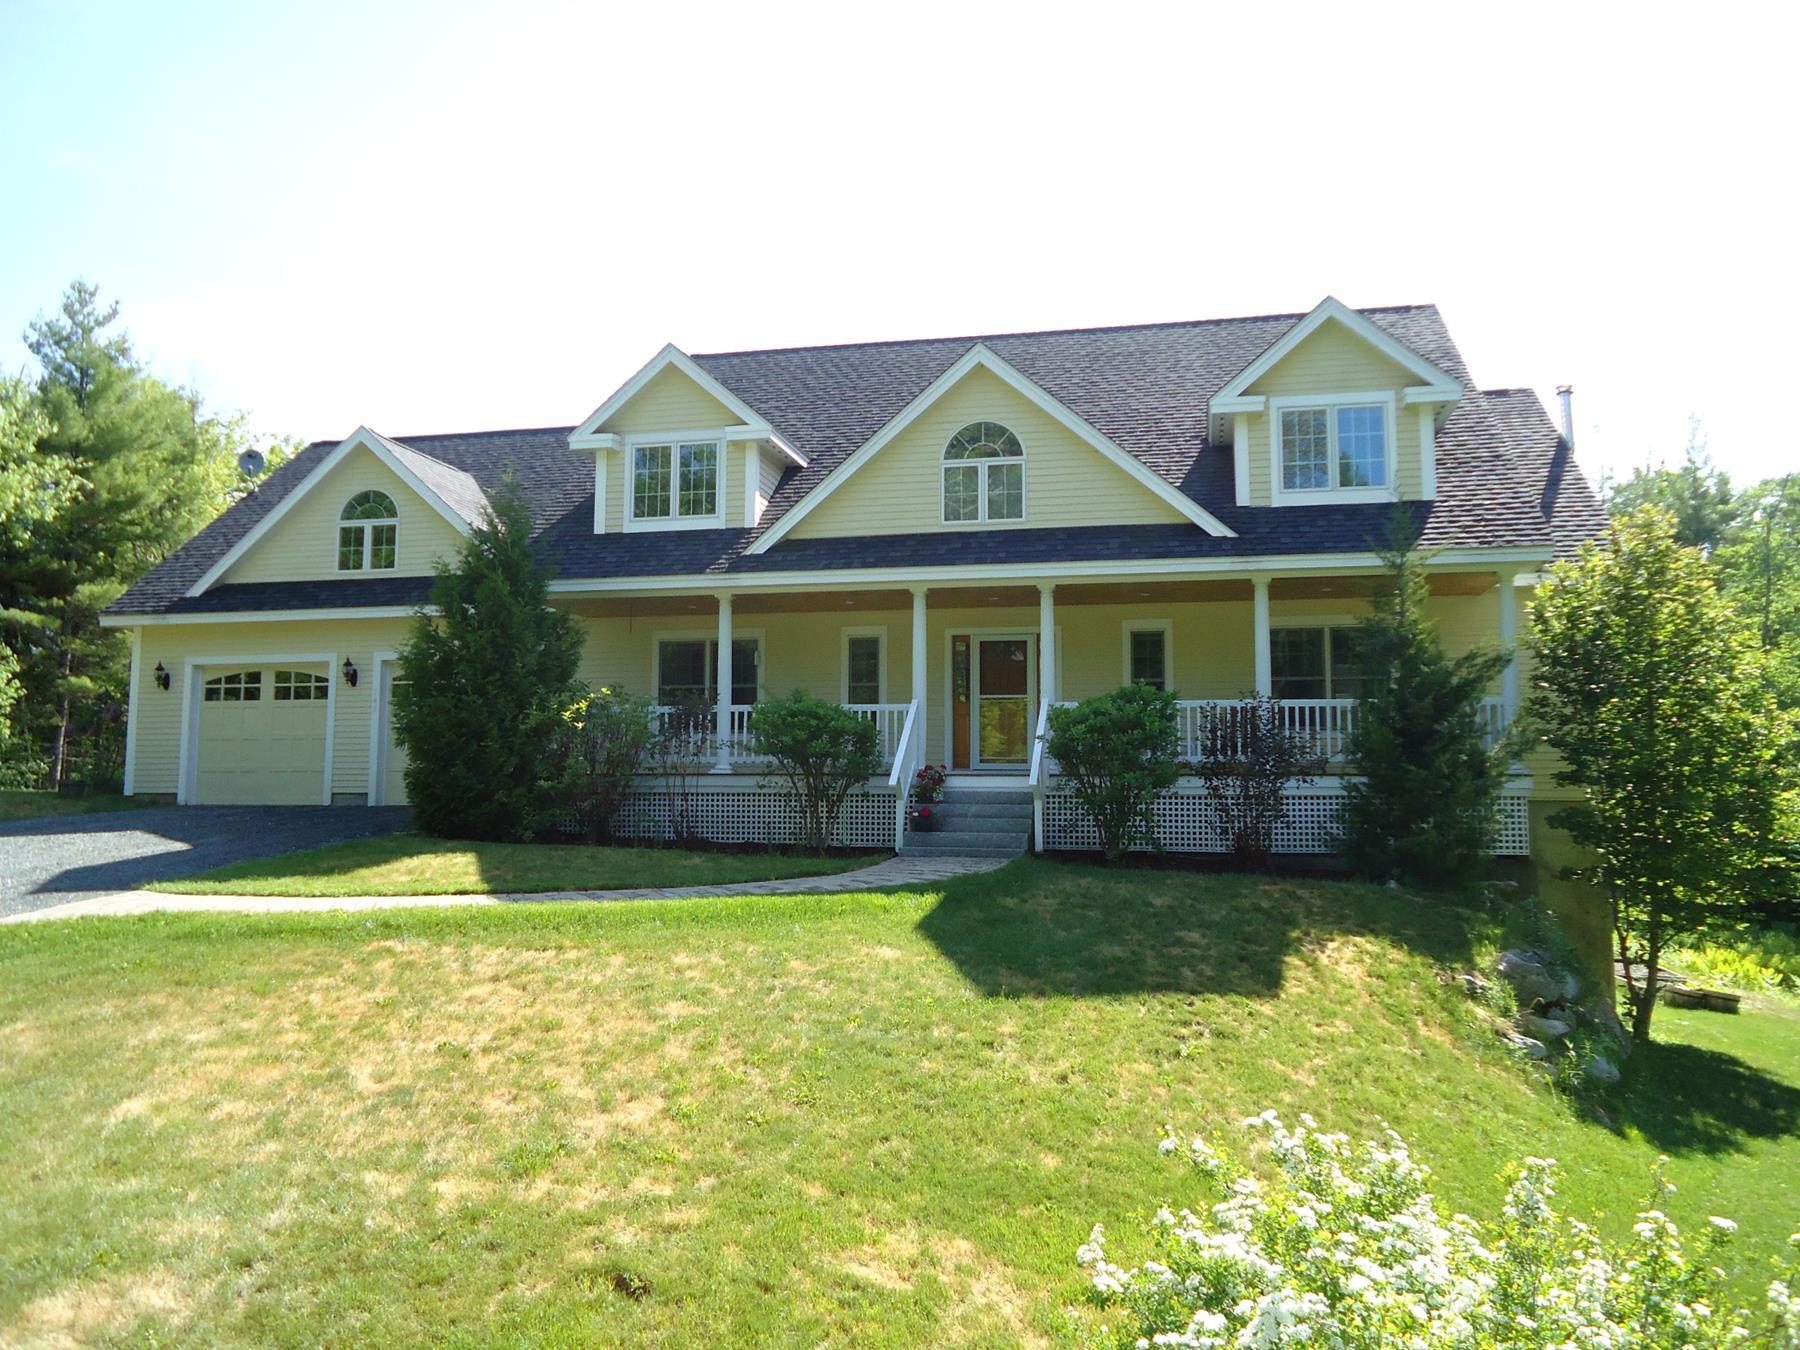 Moradia para Venda às 143 Rowell Hill Rd., New London New London, New Hampshire 03257 Estados Unidos